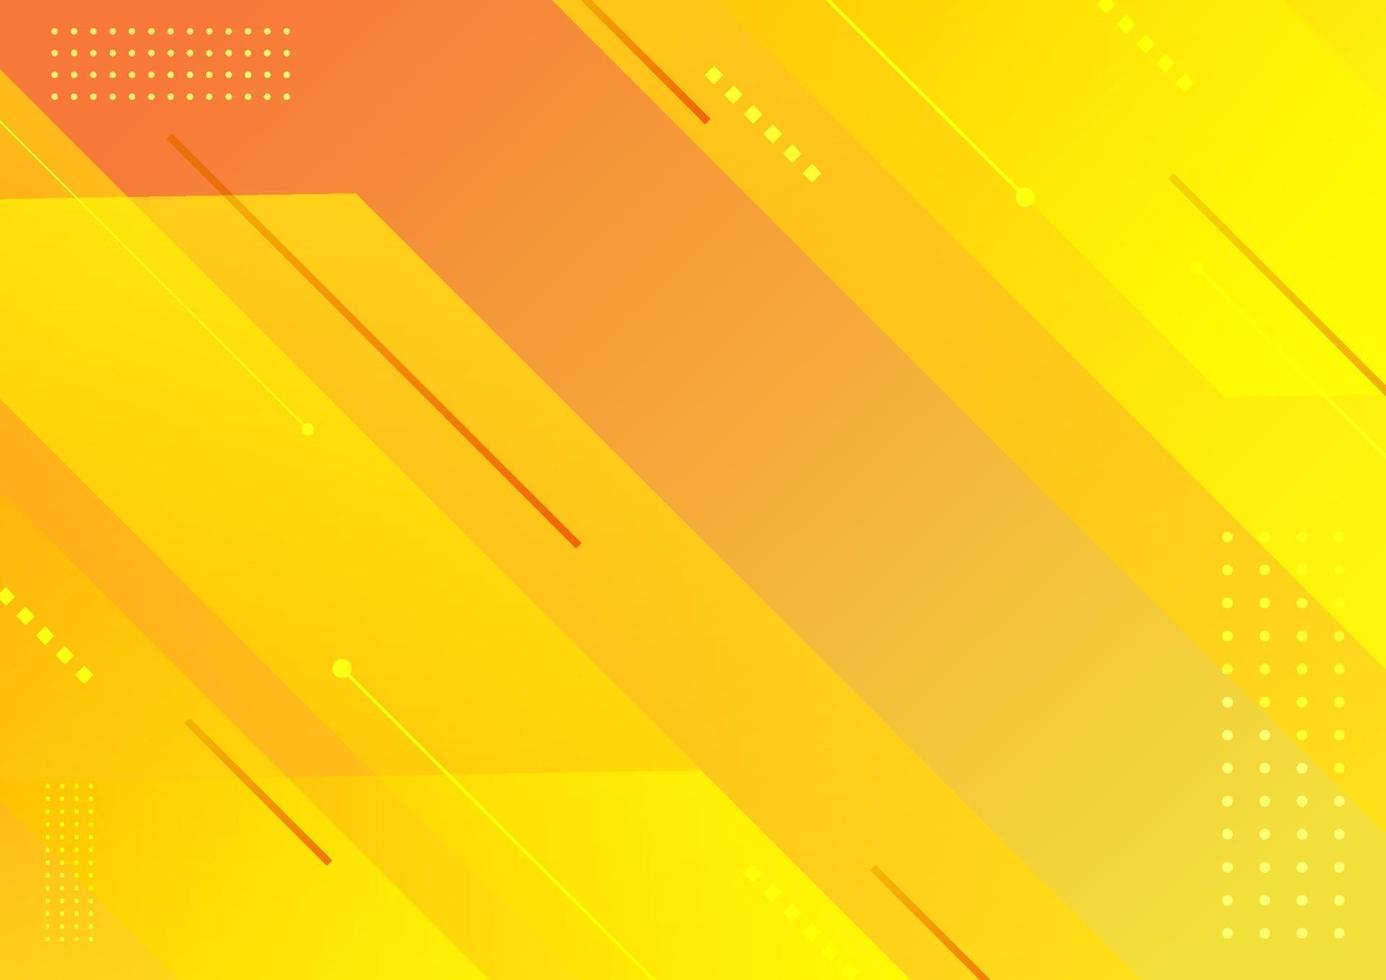 abstracte moderne strepen geometrische diagonale gele achtergrond. vector